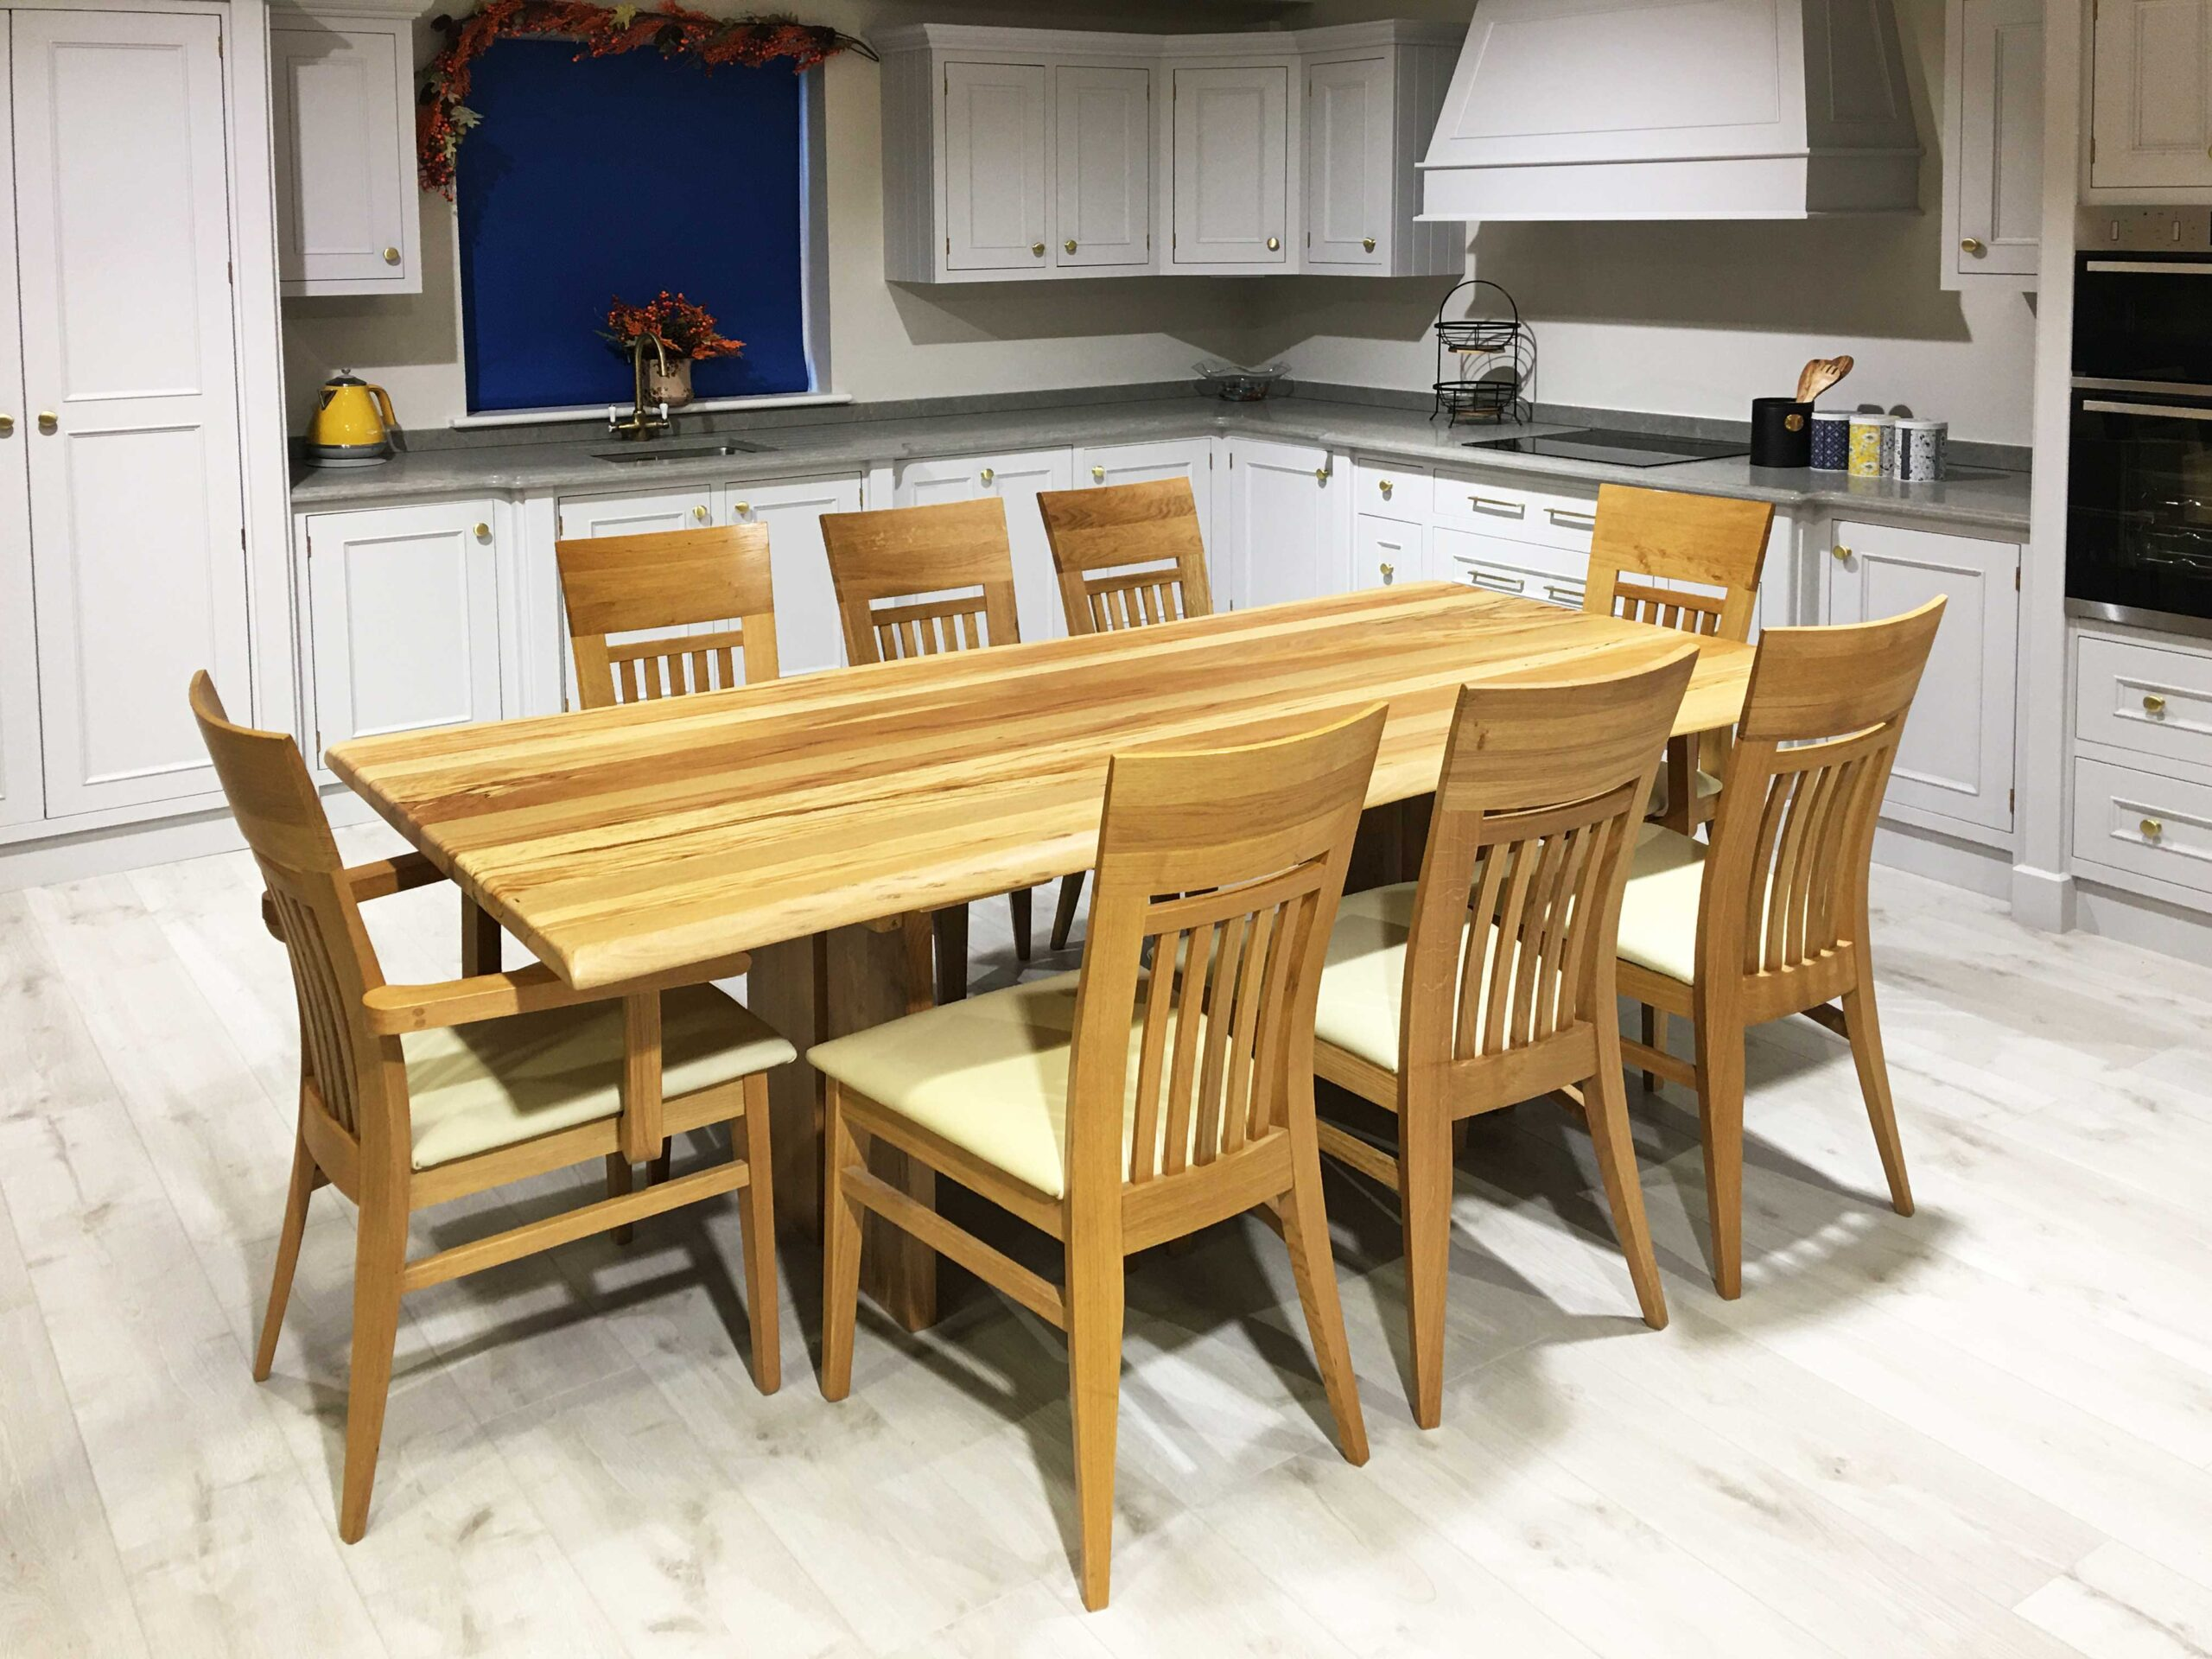 Spalted Beech Rectangular Cranoge Table 2100x1000